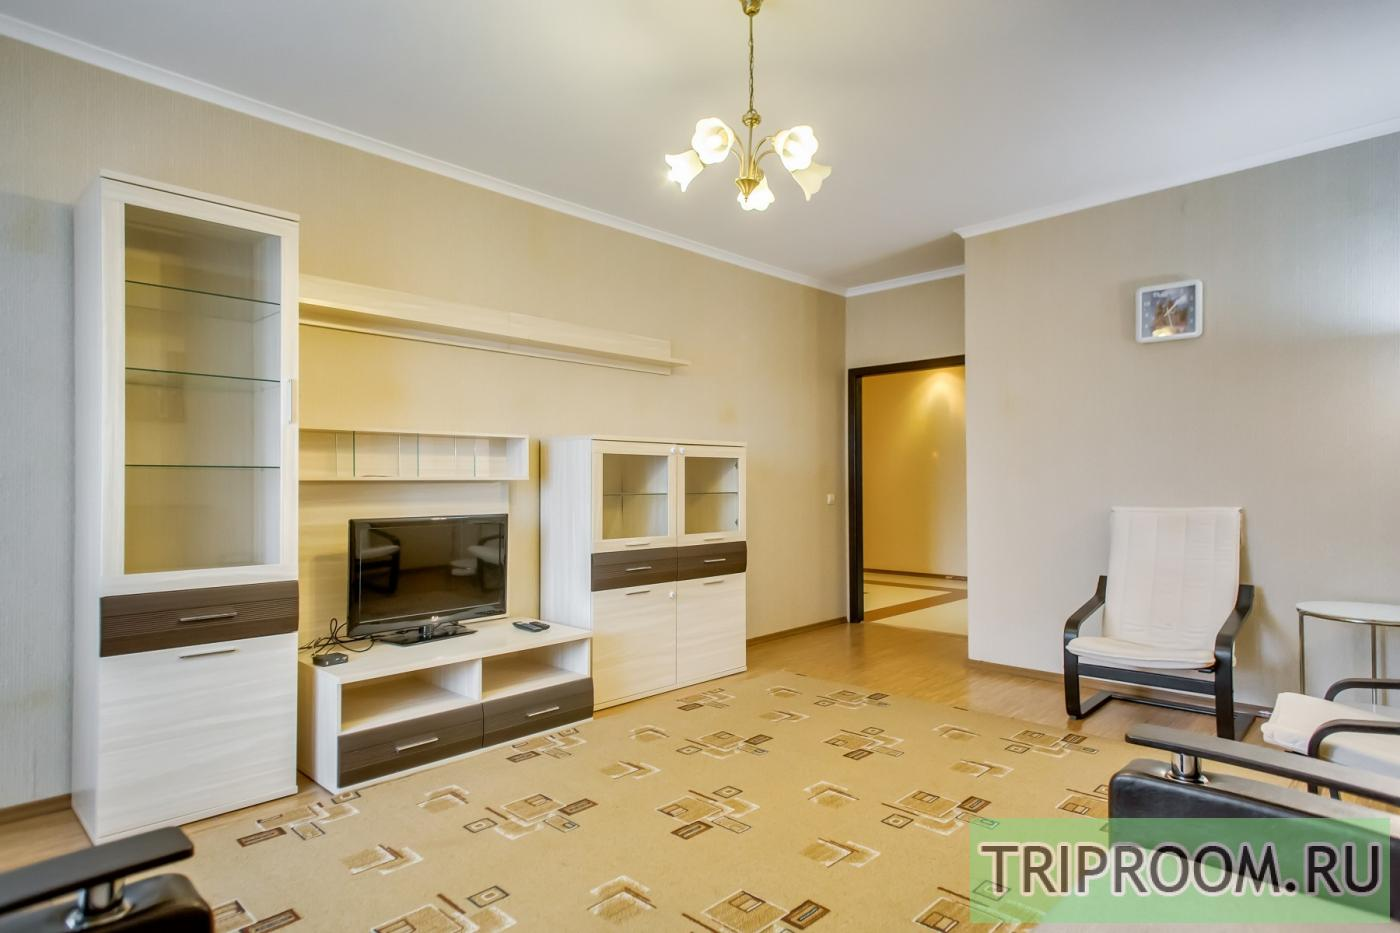 2-комнатная квартира посуточно (вариант № 23730), ул. Максима Горького улица, фото № 6